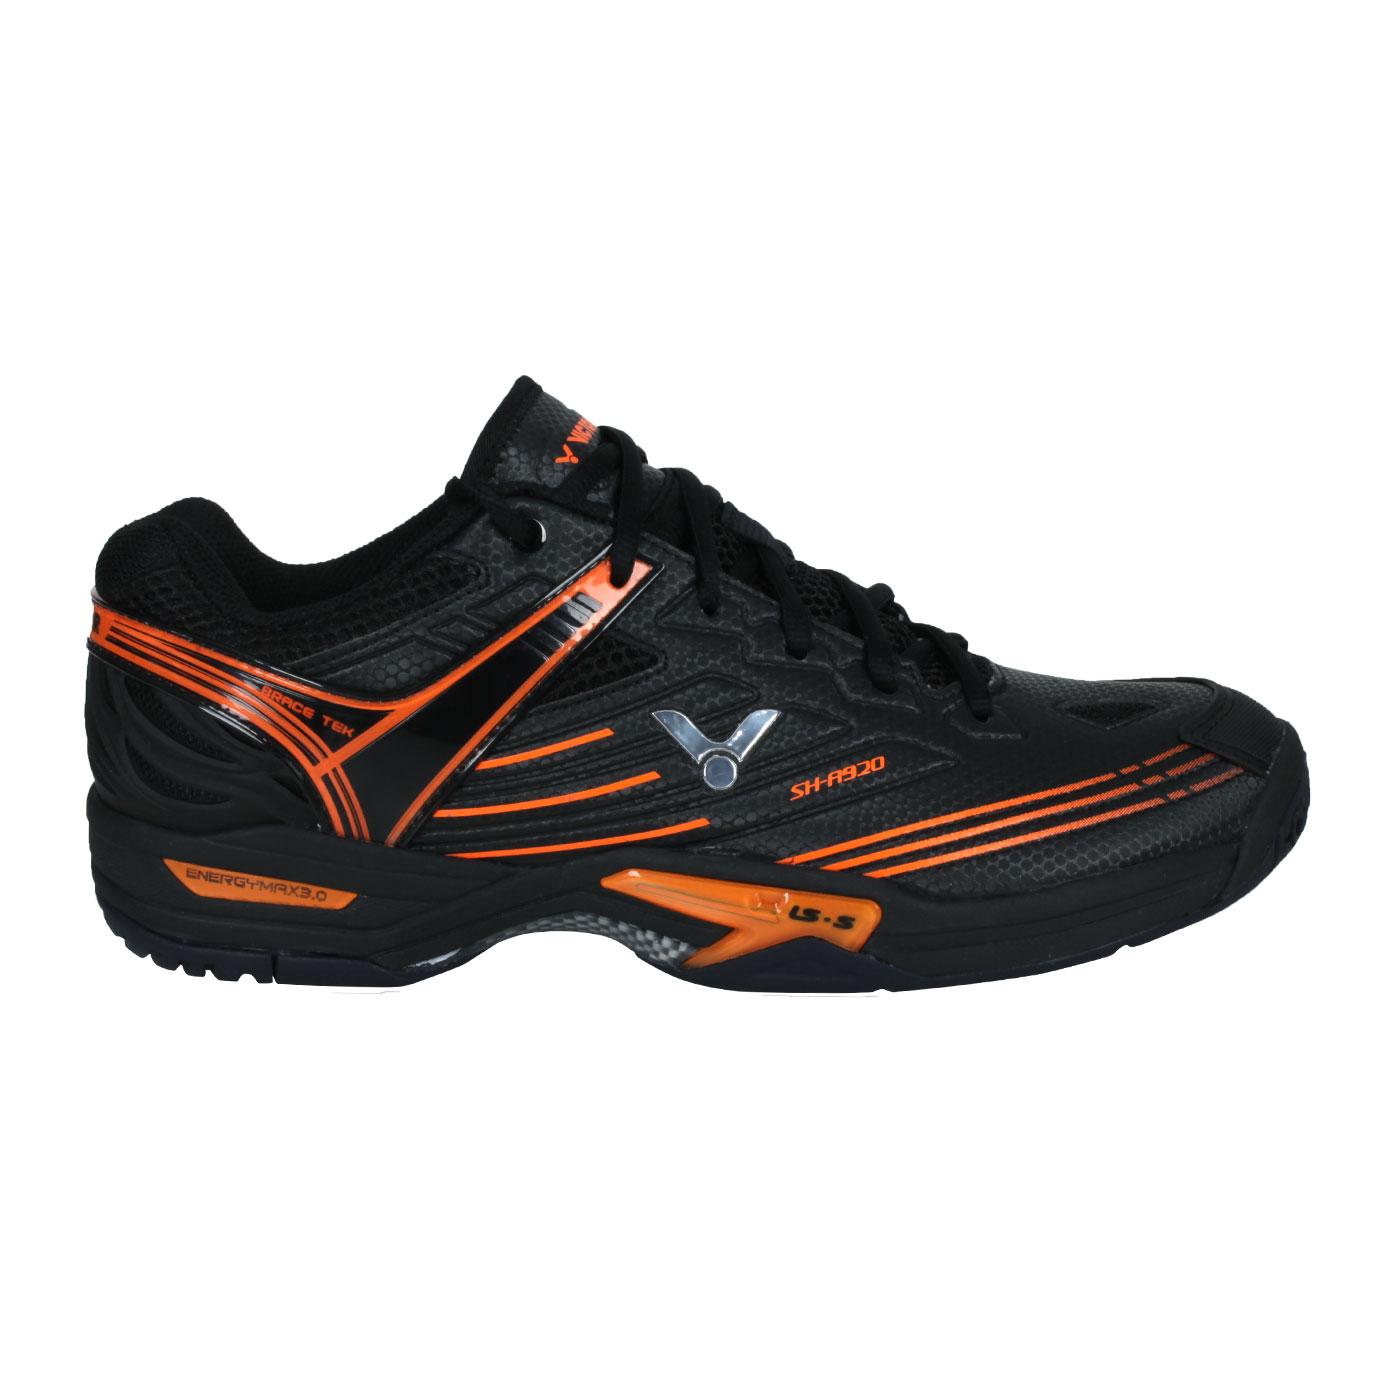 VICTOR 男款羽球鞋 SH-A920-C - 黑橘